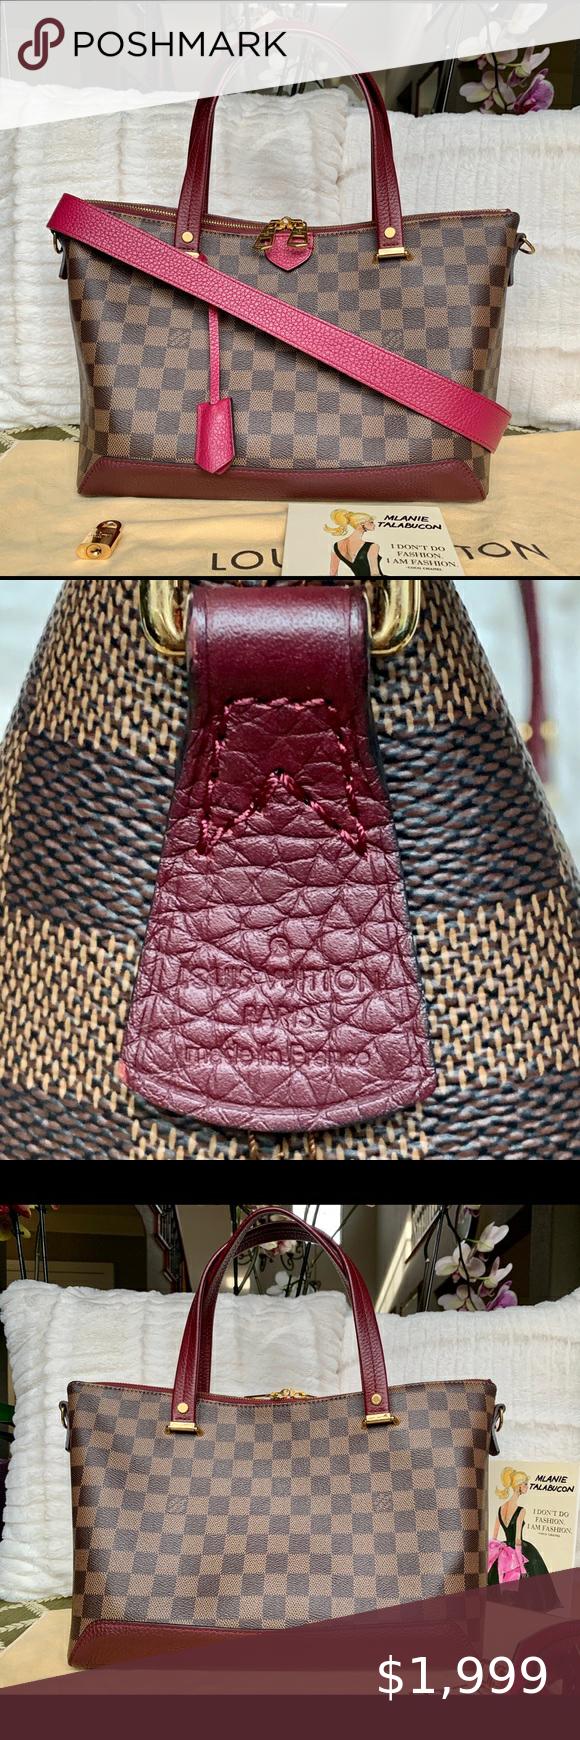 💯Auth Louis Vuitton Hyde Park Fuchsia Shoulderbag 2017 Hyde Park Damier Ebene Fuchsia Shoulder Bag  Made: France Code: AH0137 Size: W 13.5